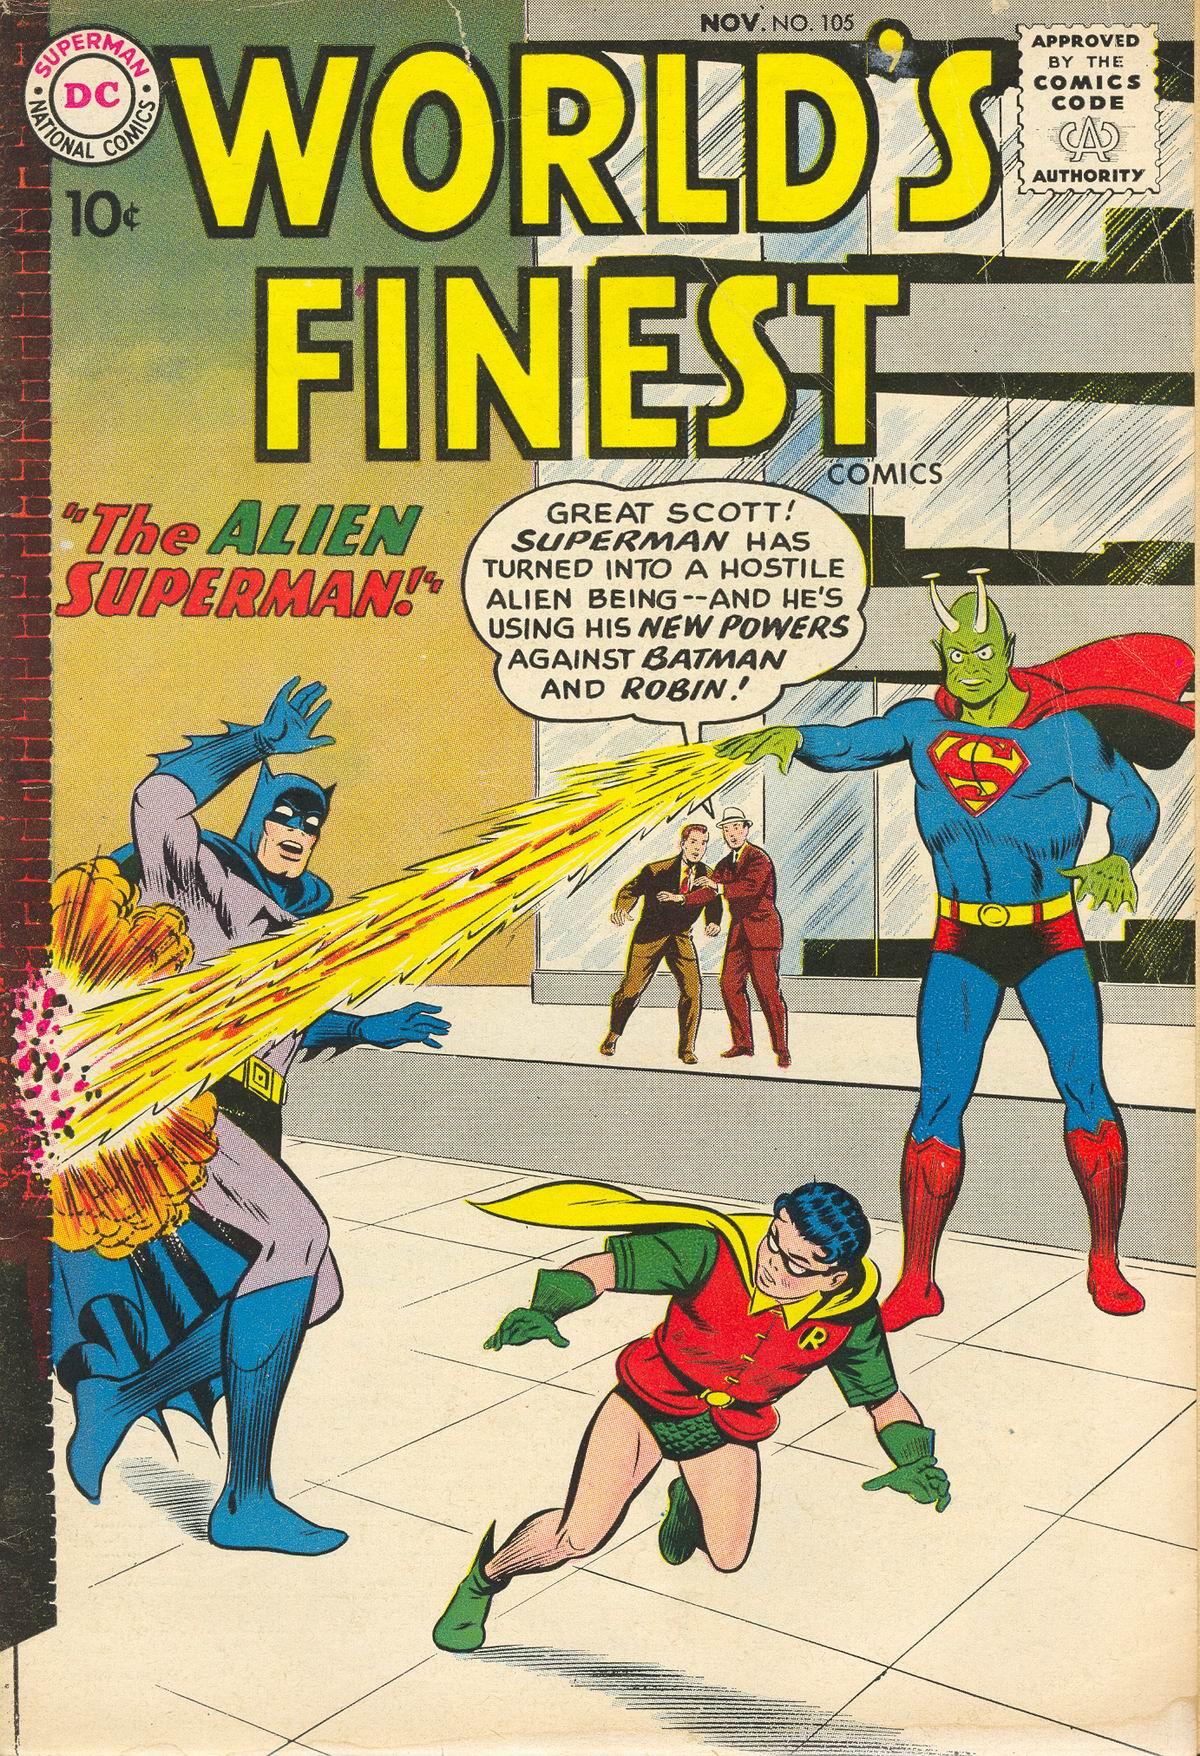 Read online World's Finest Comics comic -  Issue #105 - 1